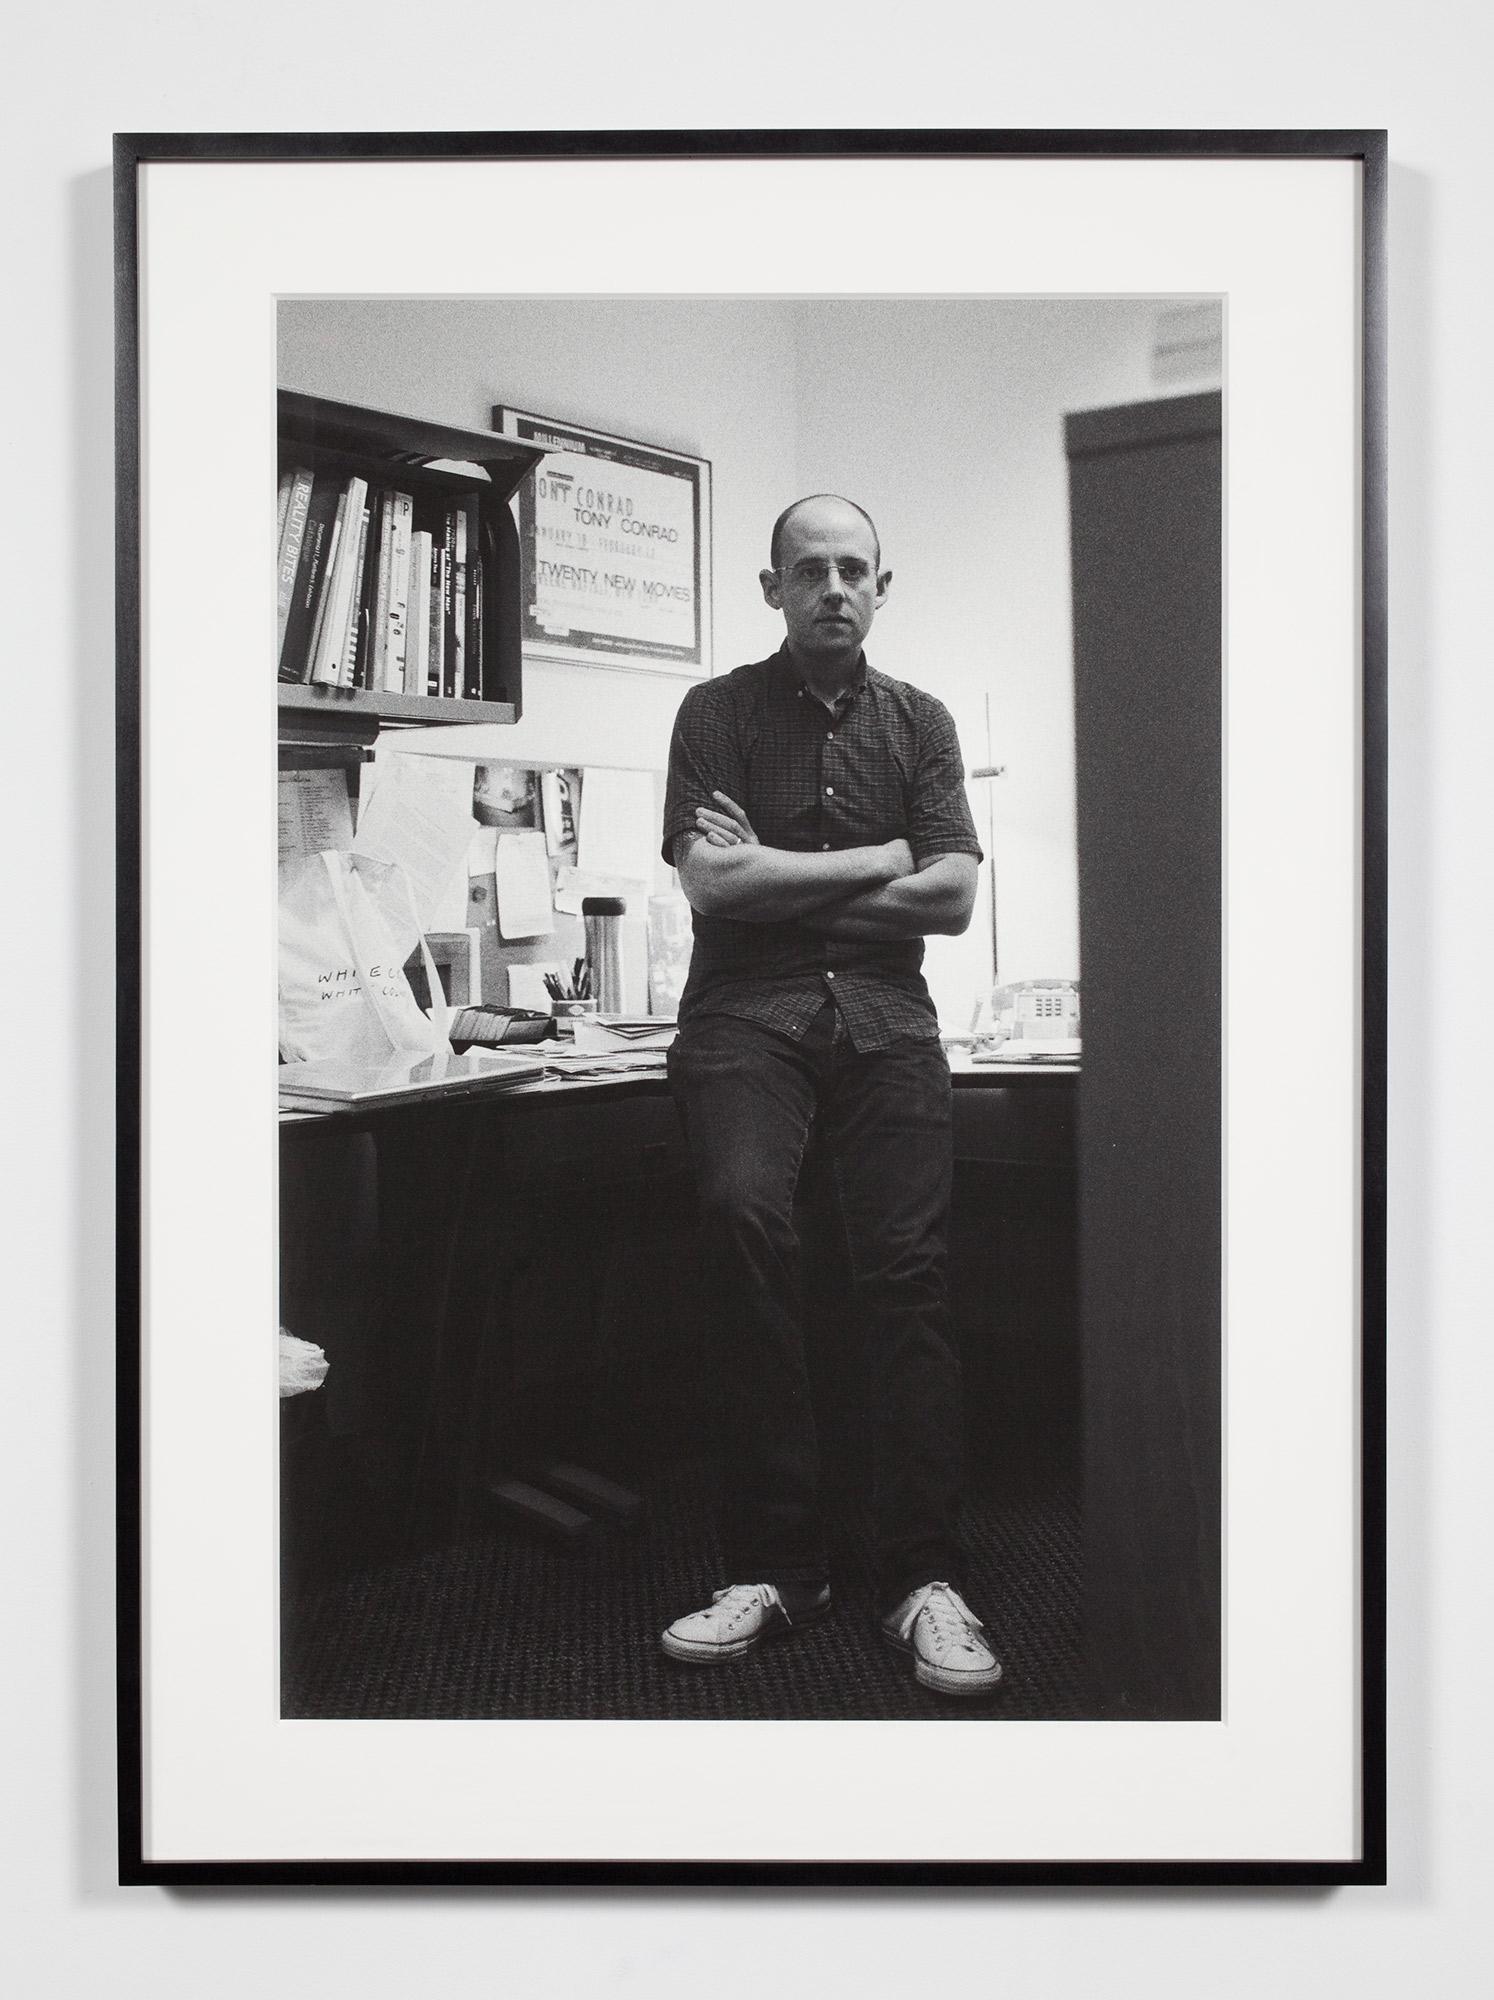 Associate Curator, University Museum (JP), Ann Arbor, Michigan, September 19, 2008    2009   Epson Ultrachrome K3 archival ink jet print on Hahnemühle Photo Rag paper  36 3/8 x 26 3/8 inches   Industrial Portraits, 2008–